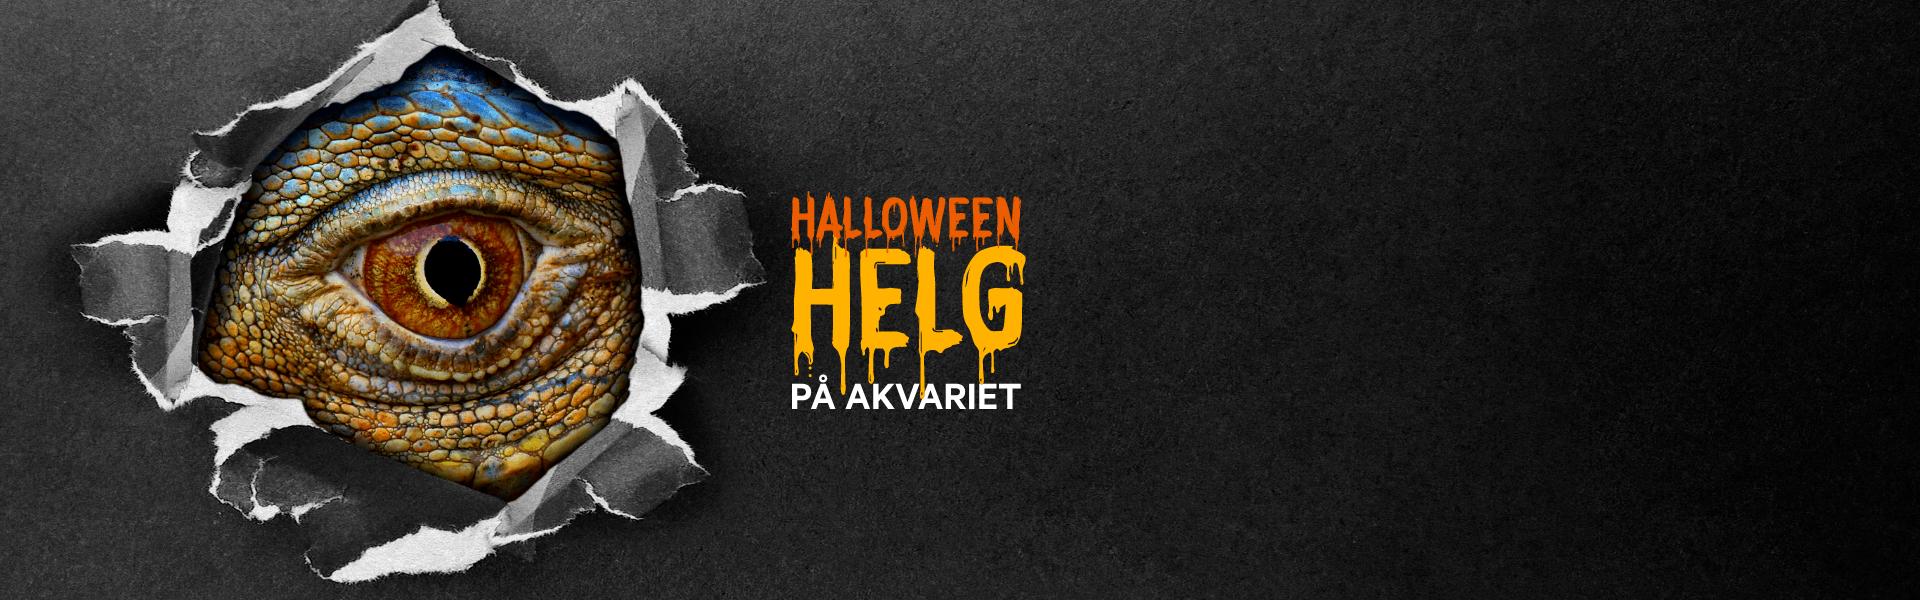 Halloweenhelg